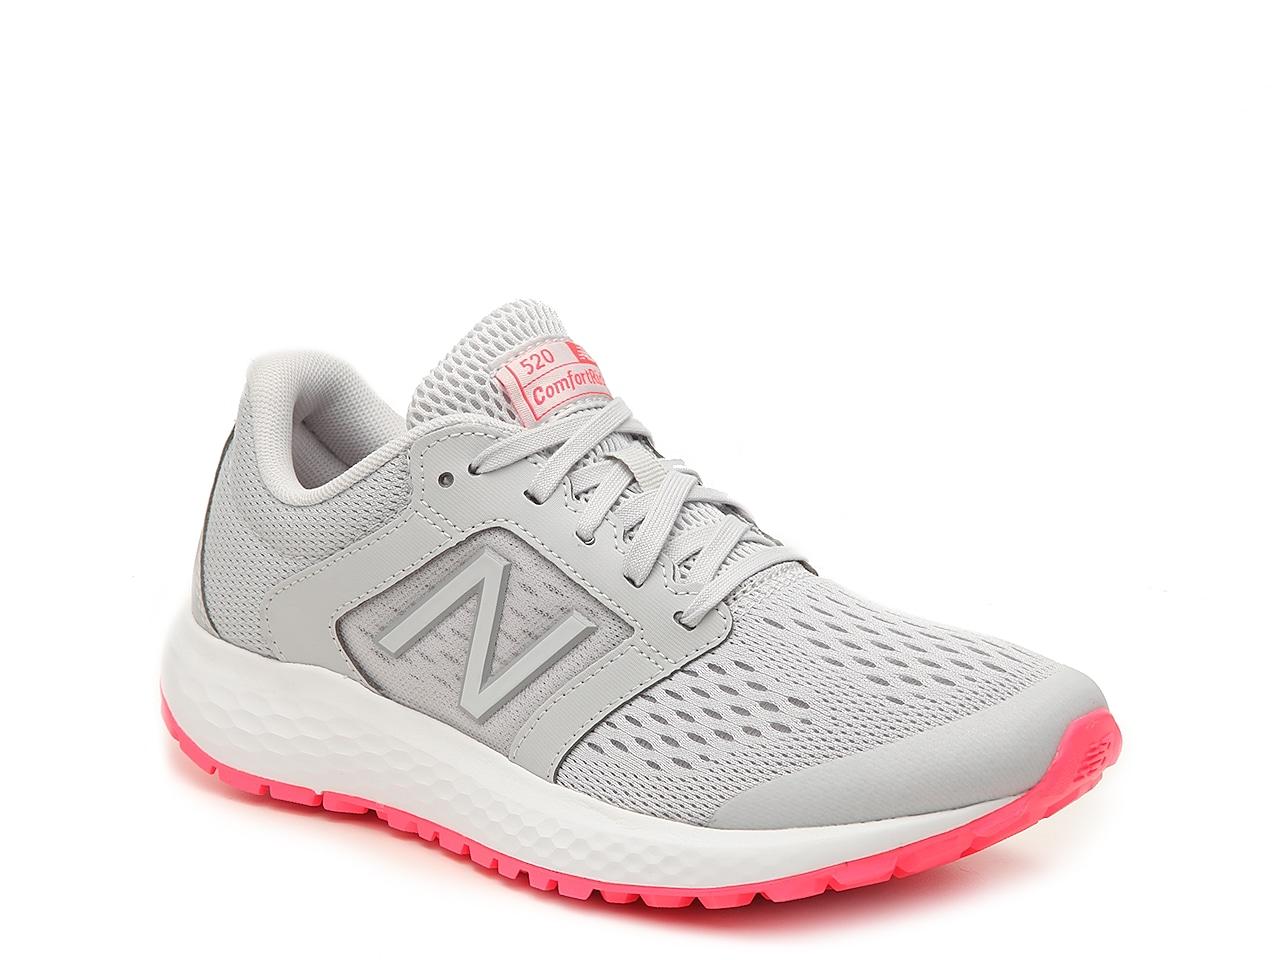 520 ComfortRide Lightweight Running Shoe - Women's